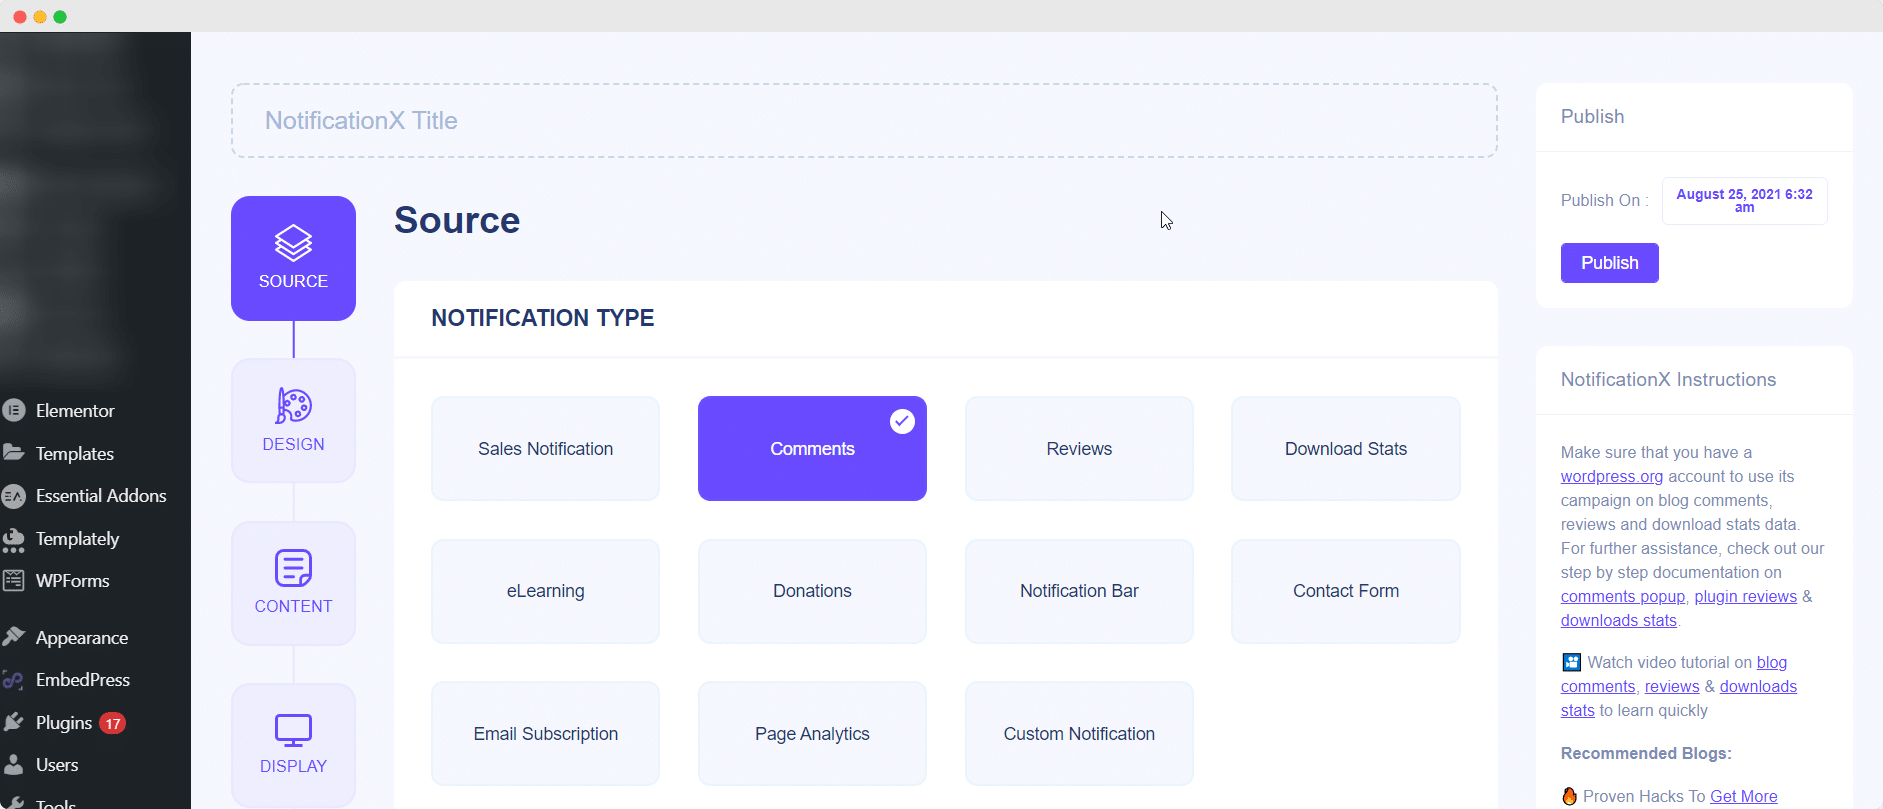 NotificationX Random Control Order